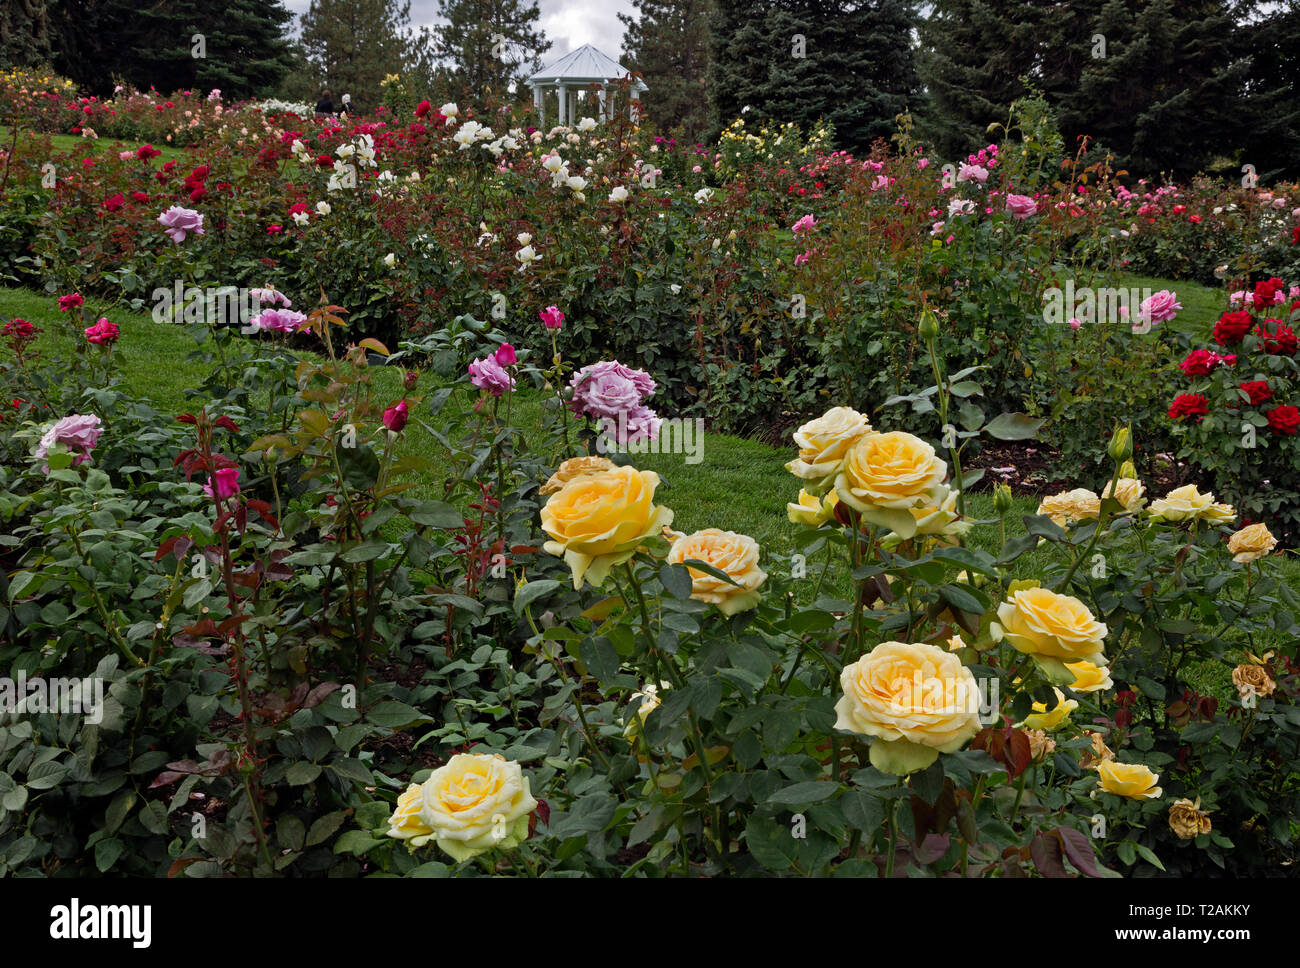 WA16085-00...WASHINGTON - Colorful Rose Garden at Manito Park in Spokane. Stock Photo